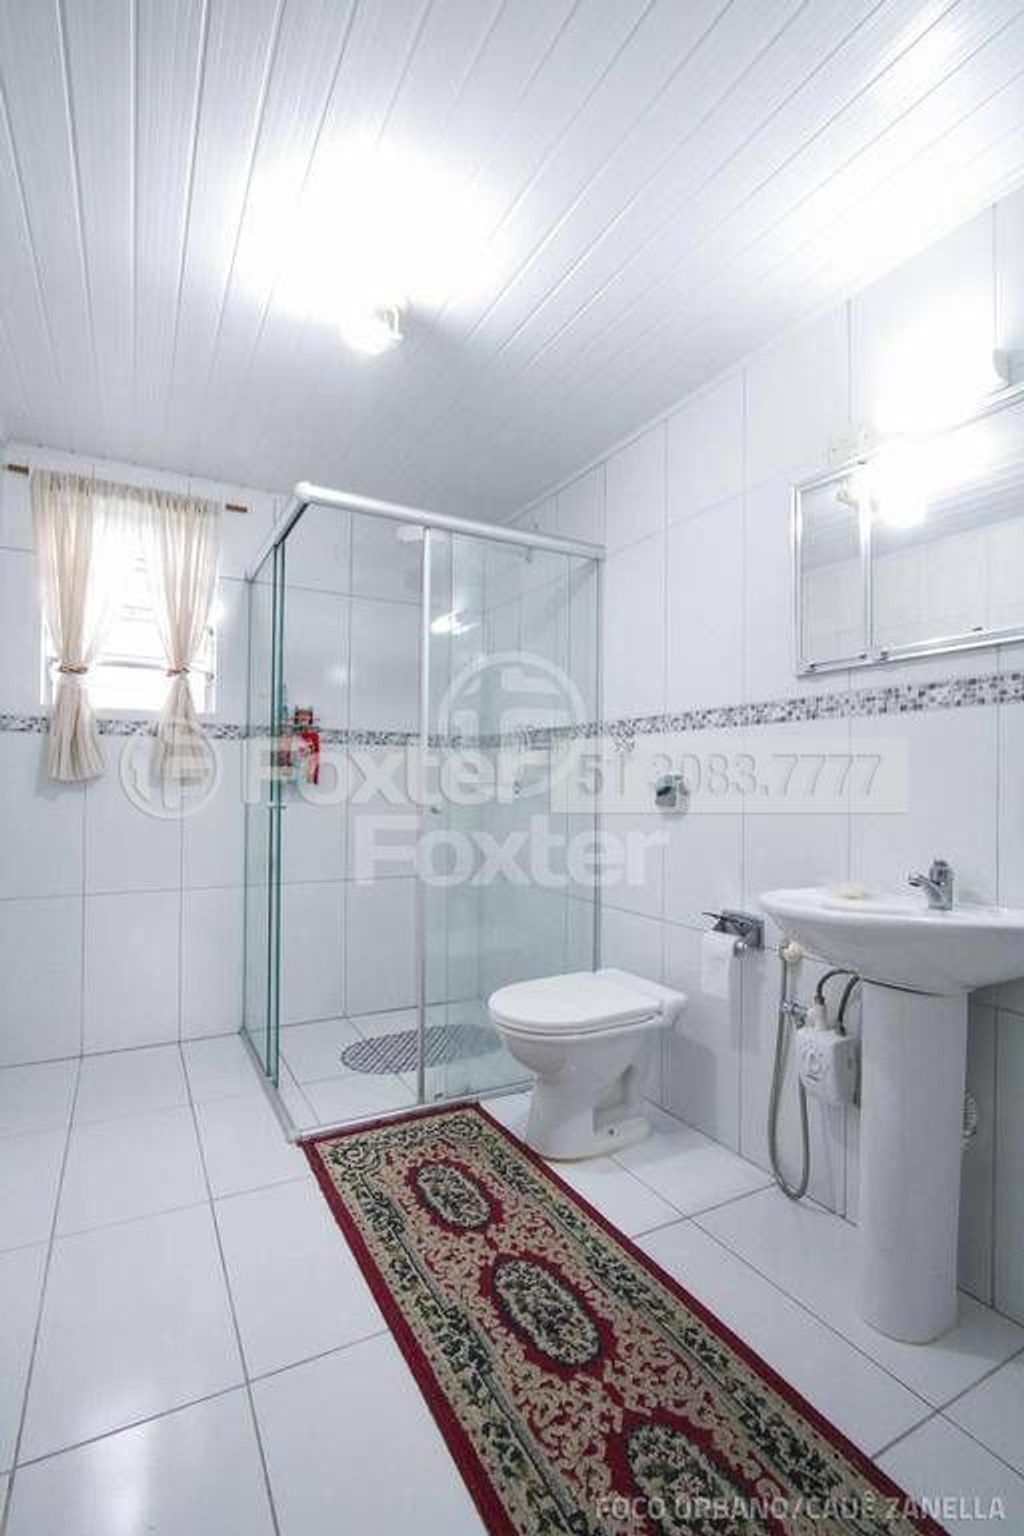 Casa 3 Dorm, Protásio Alves, Porto Alegre (119233) - Foto 12